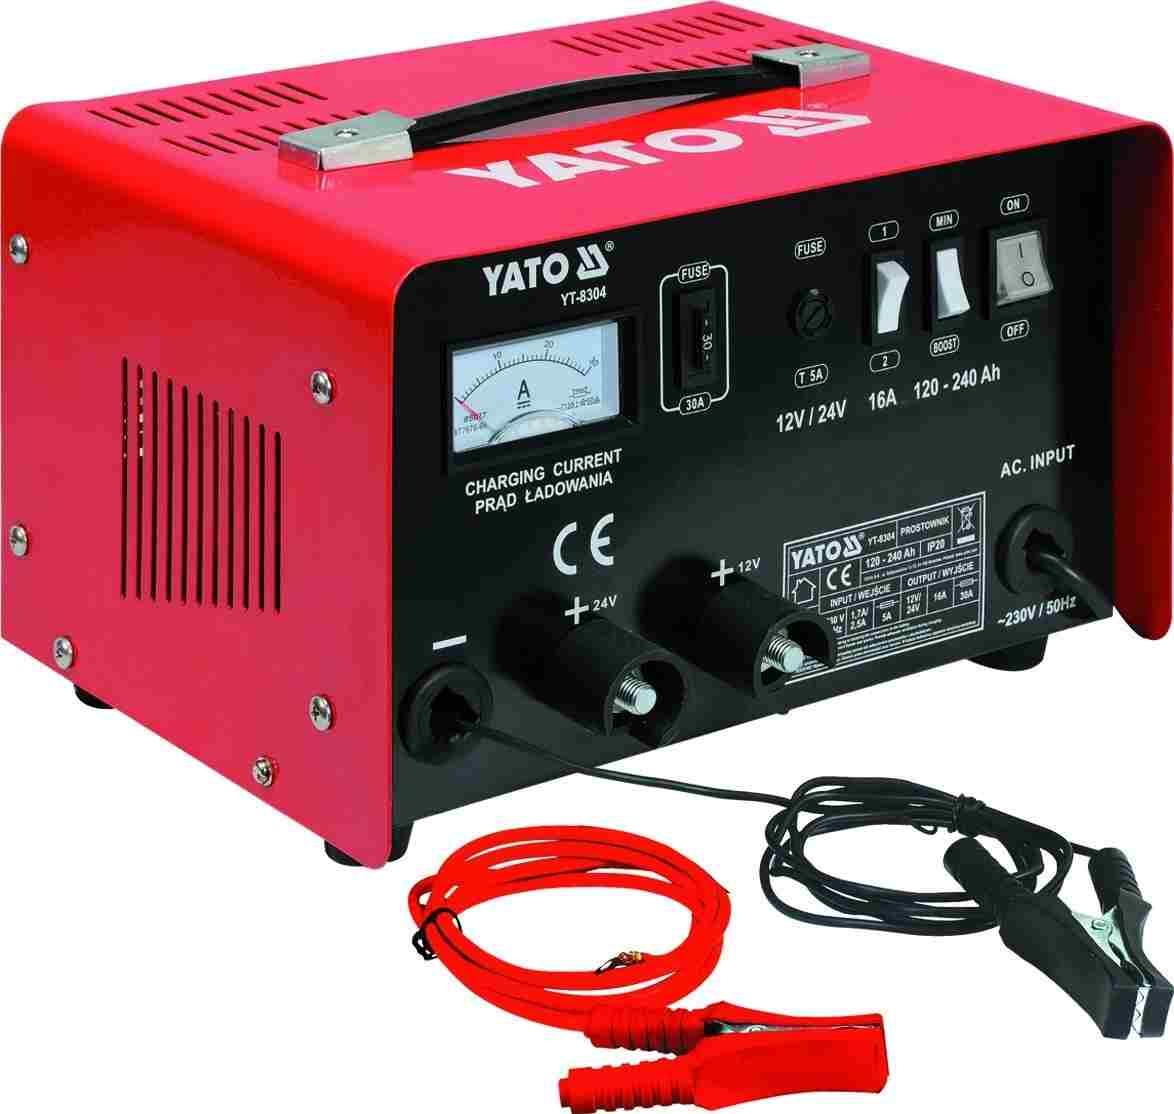 Зарядное устройство 12/24В 16А 240Ач YATO YT8304